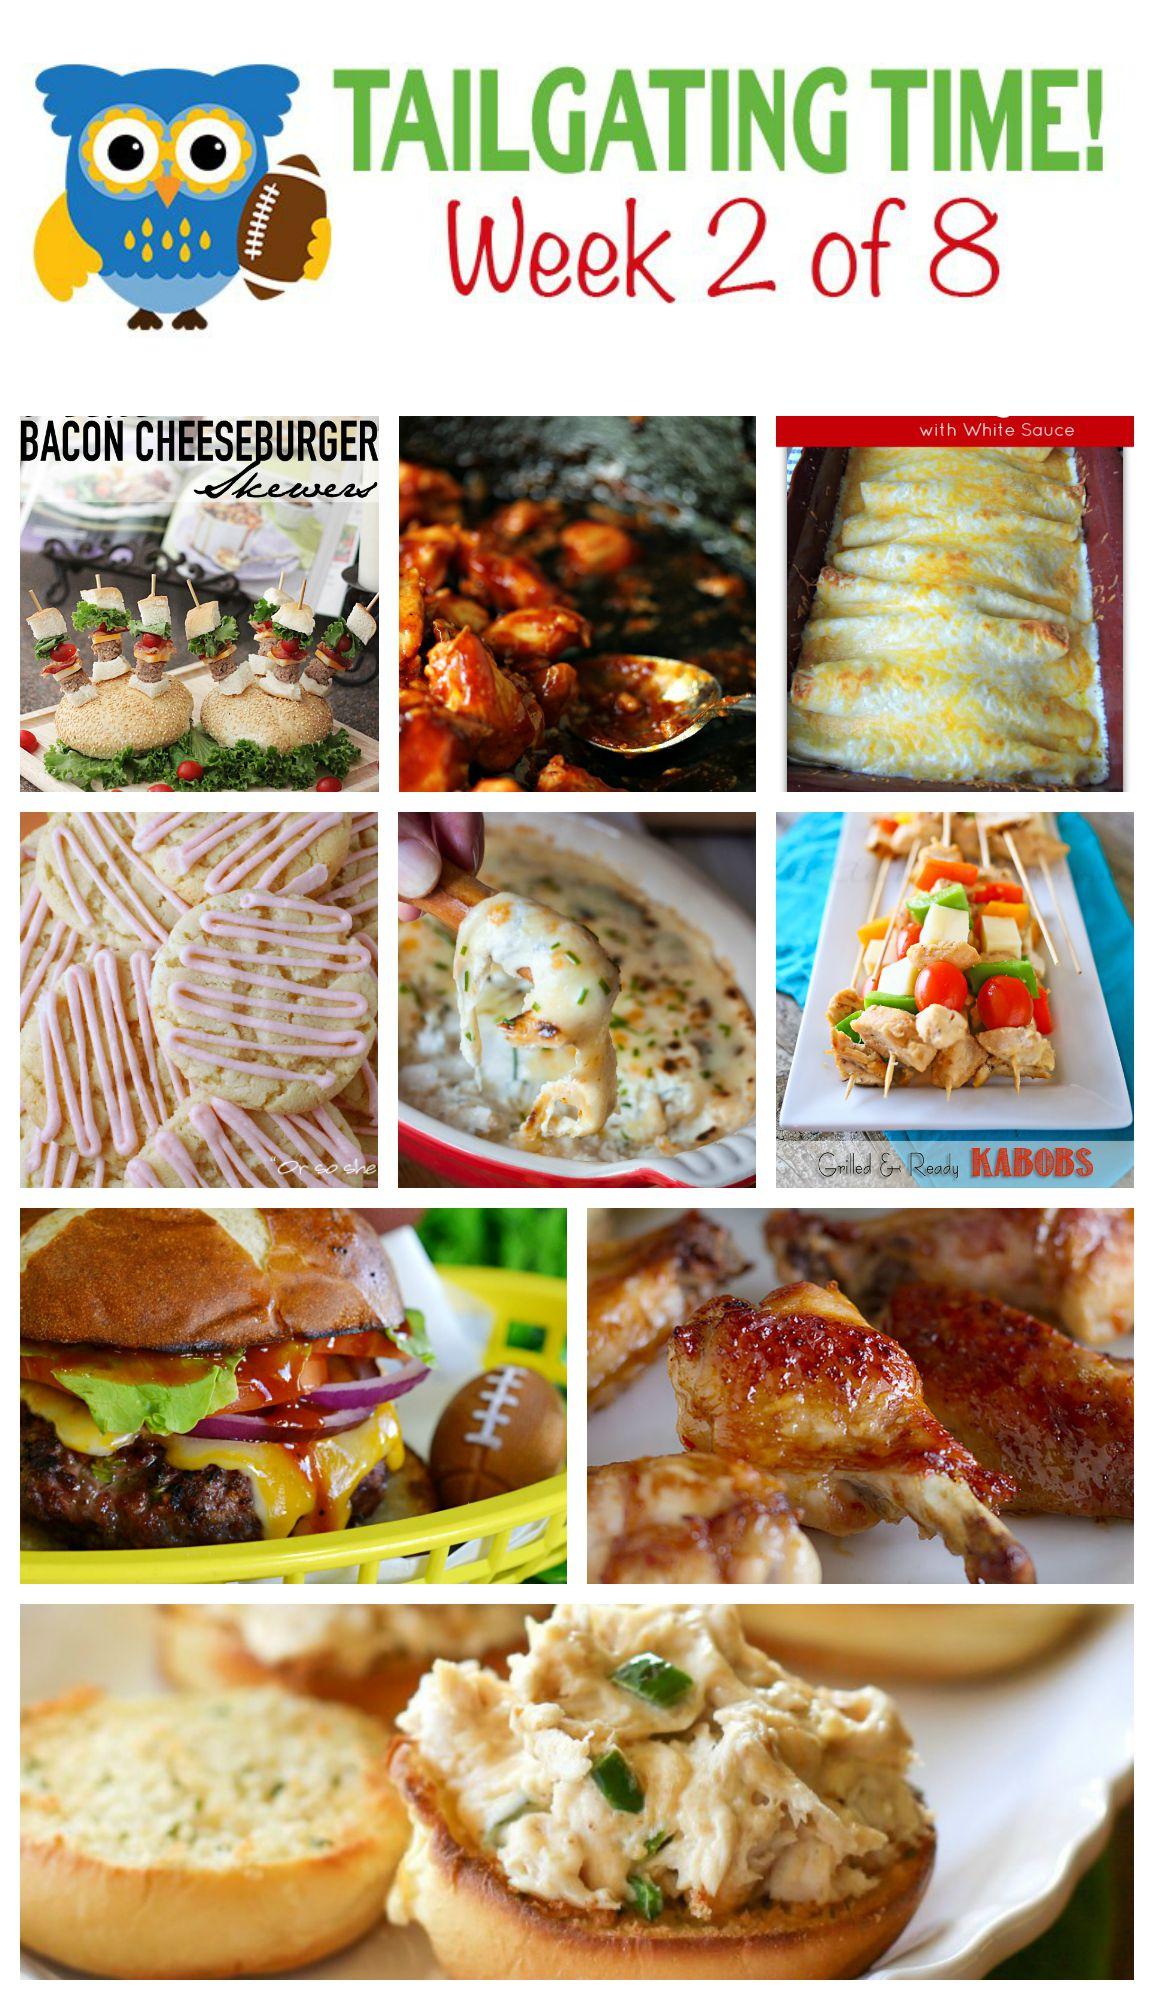 Tailgating Food Ideas Week 2   Made From Pinterest PEXHVaJA